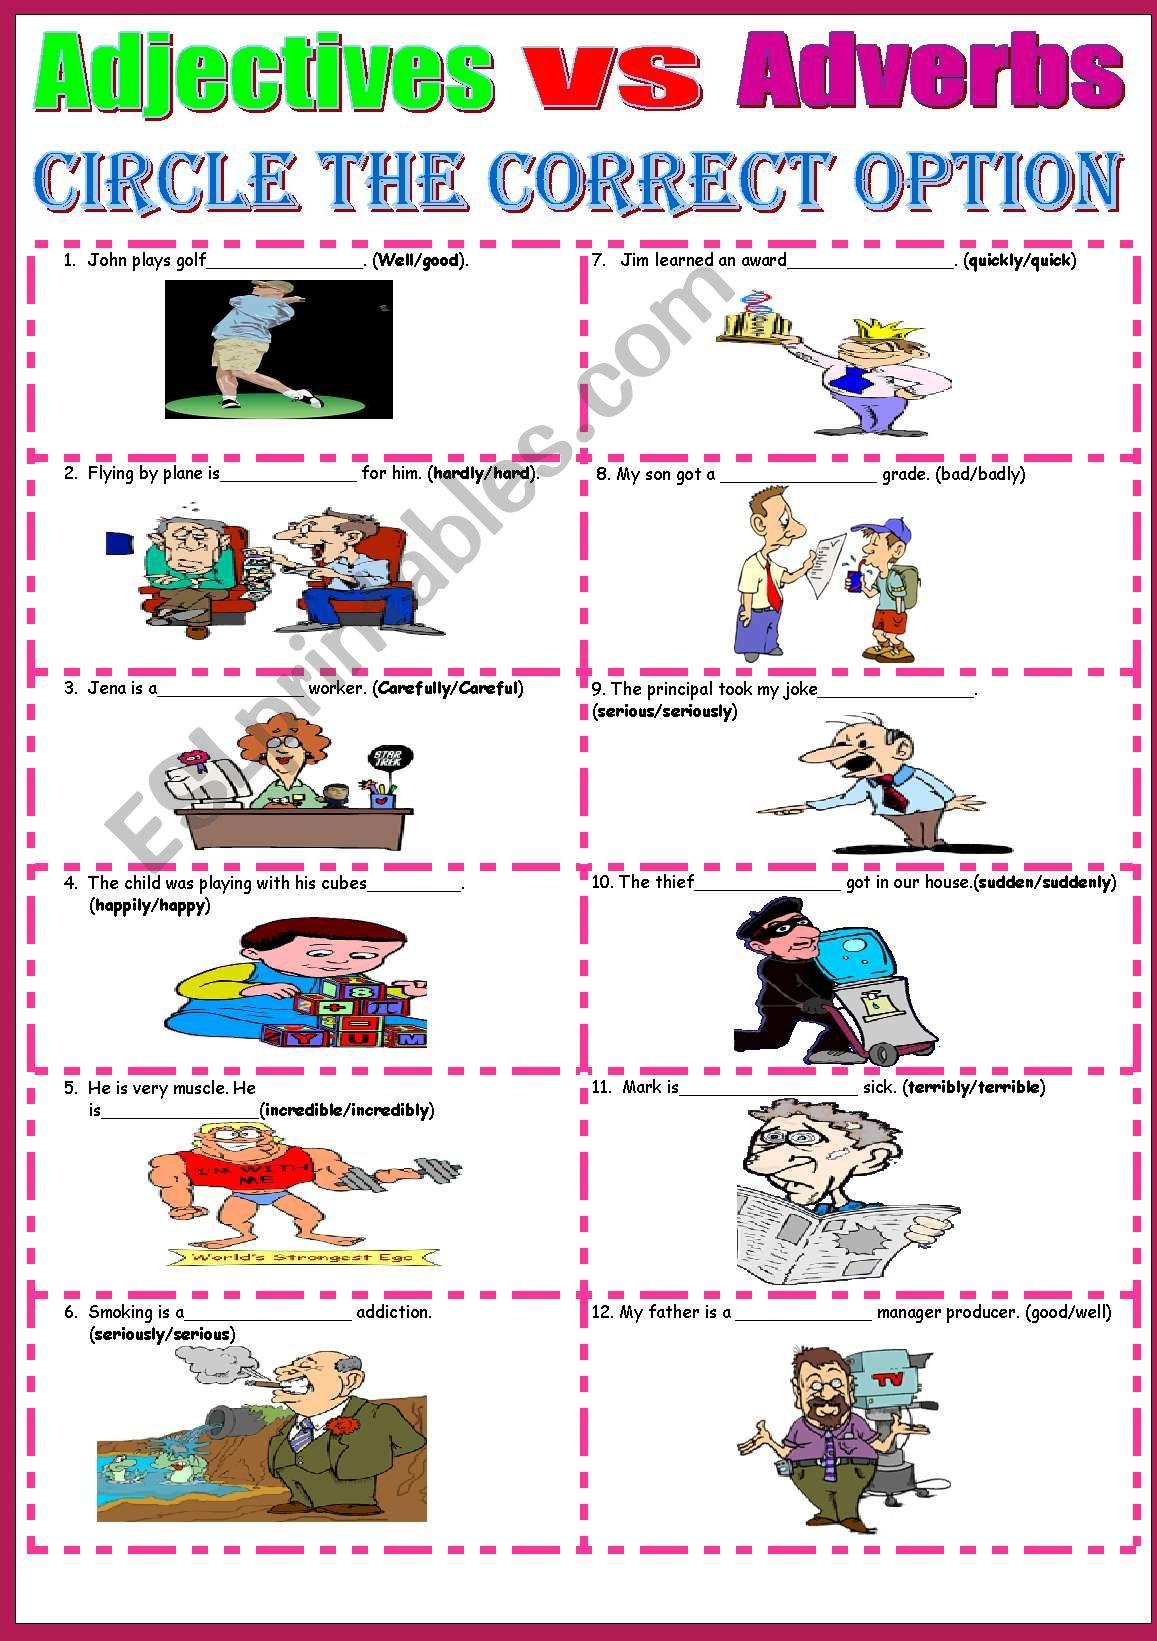 Adverbs vs Adjectives - ESL worksheet by la mente maestra